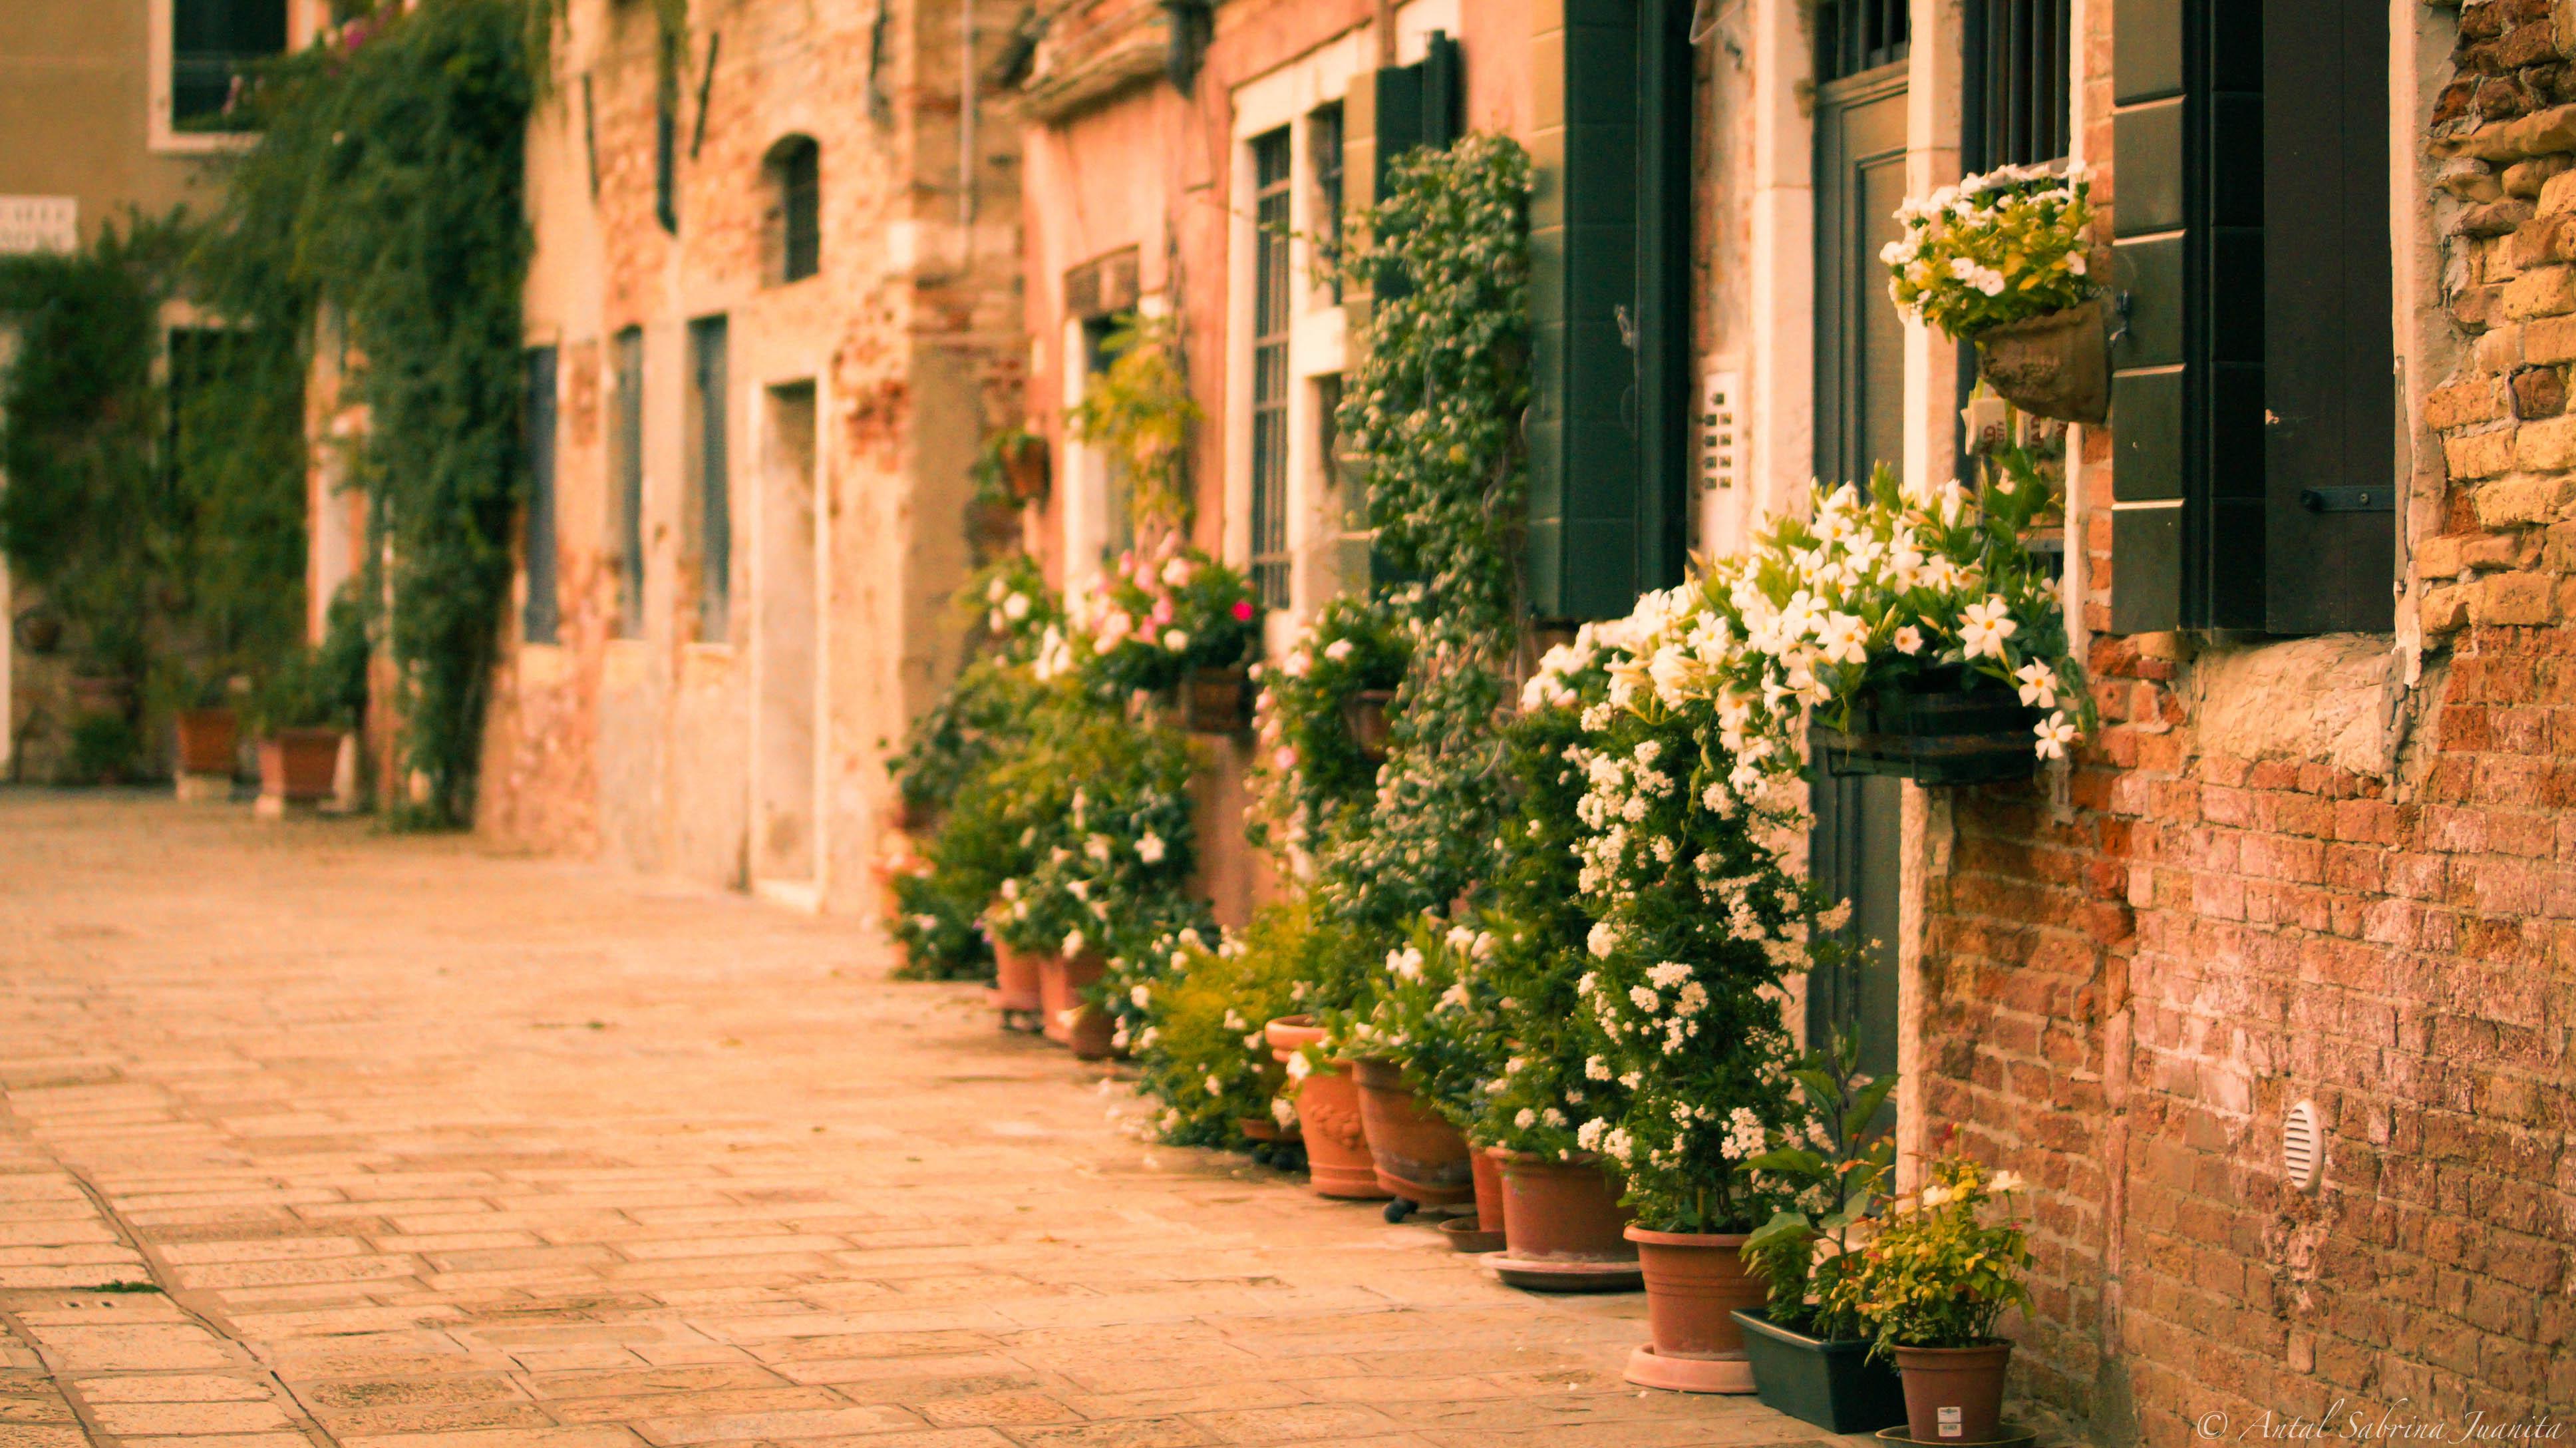 Wallpaper flowers garden street italy plants venice for Classic house green street